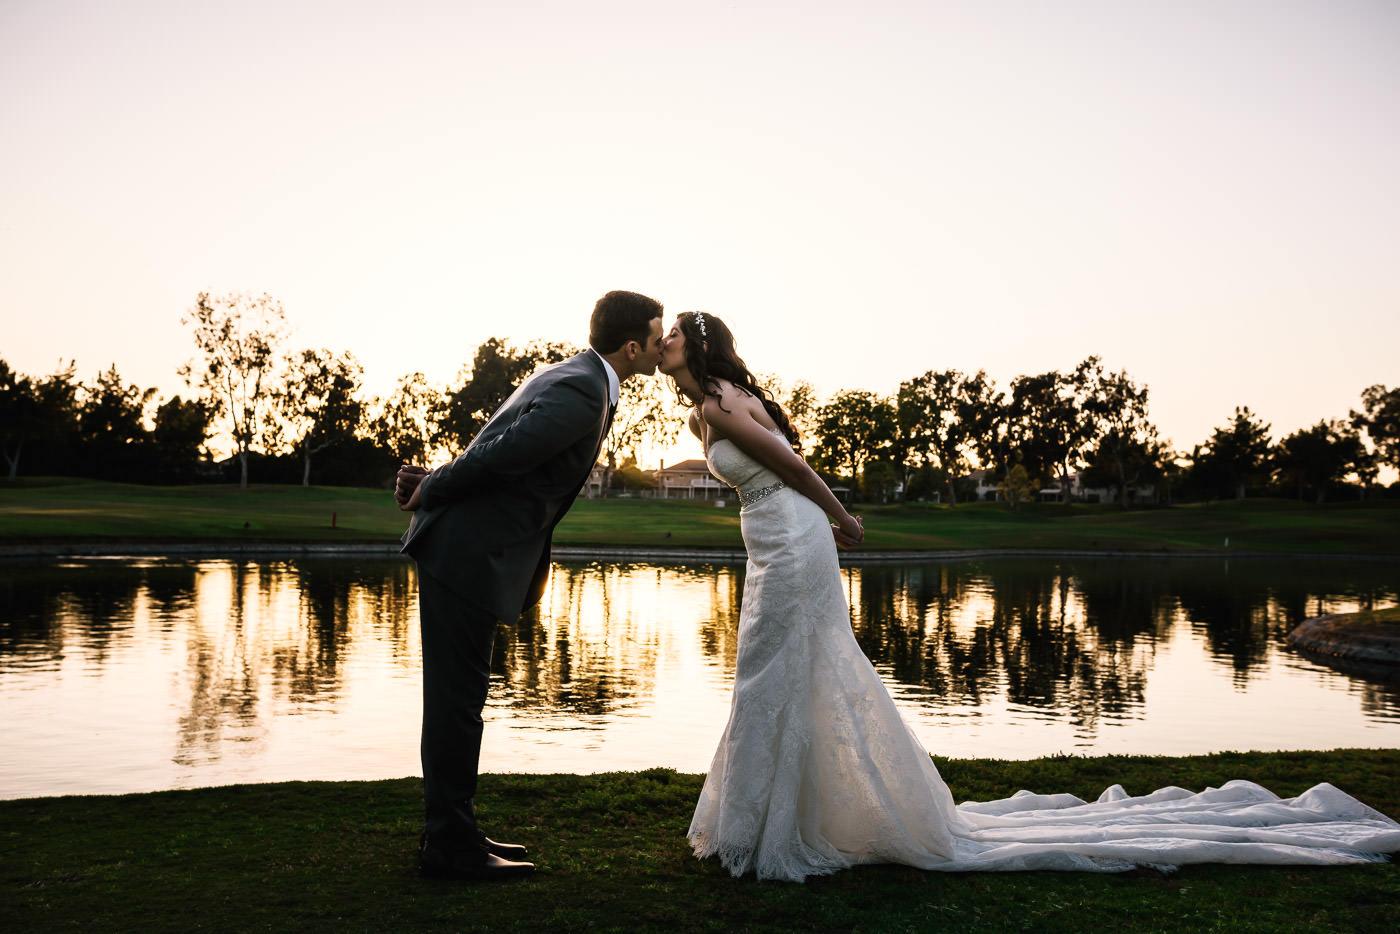 Wedding photographer in Placenita California.